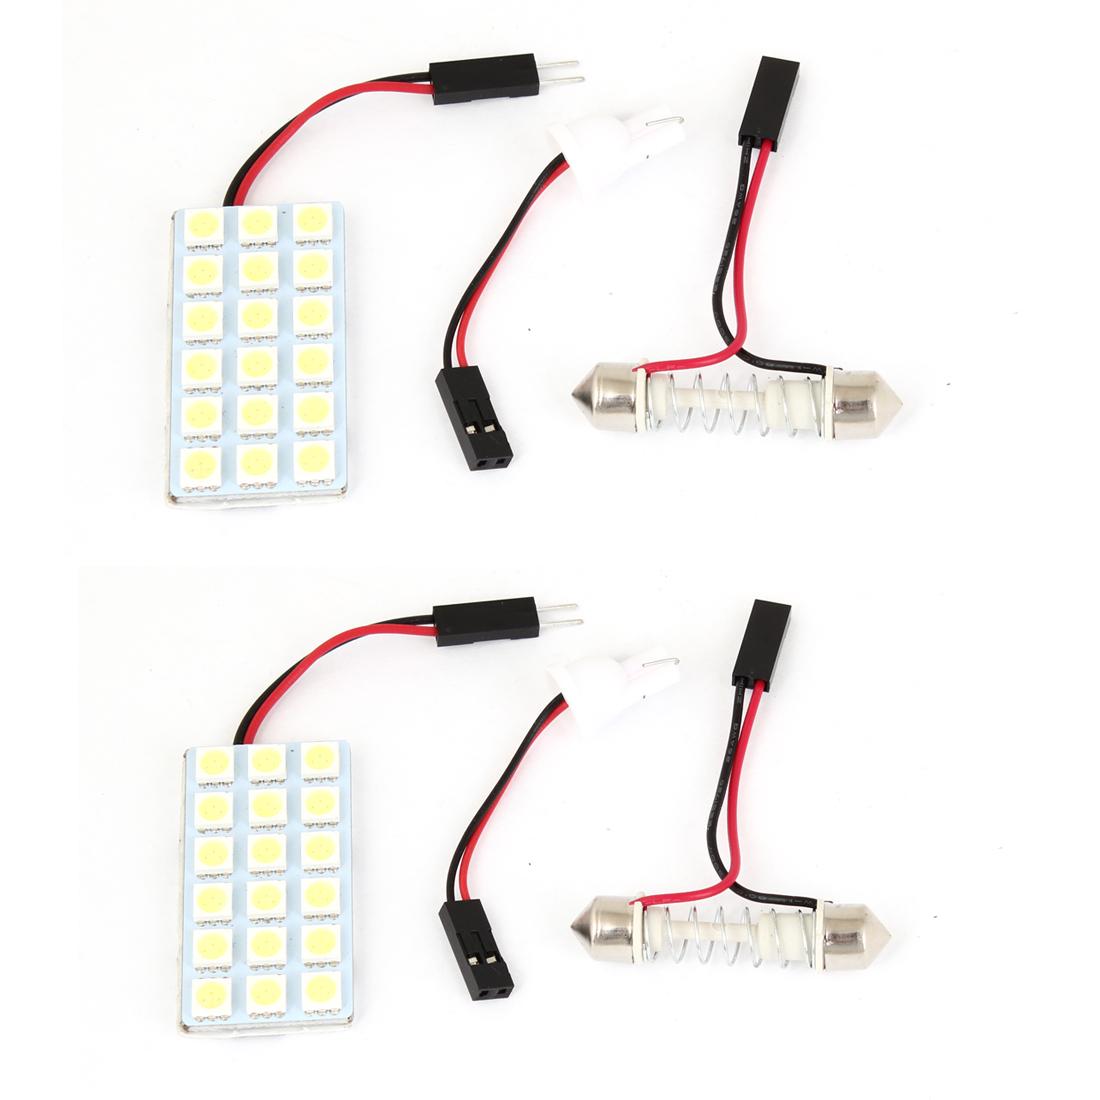 Car Interior White 18 LED 5050 SMD Dome Light Bulb w T10 Festoon Adapters 2pcs